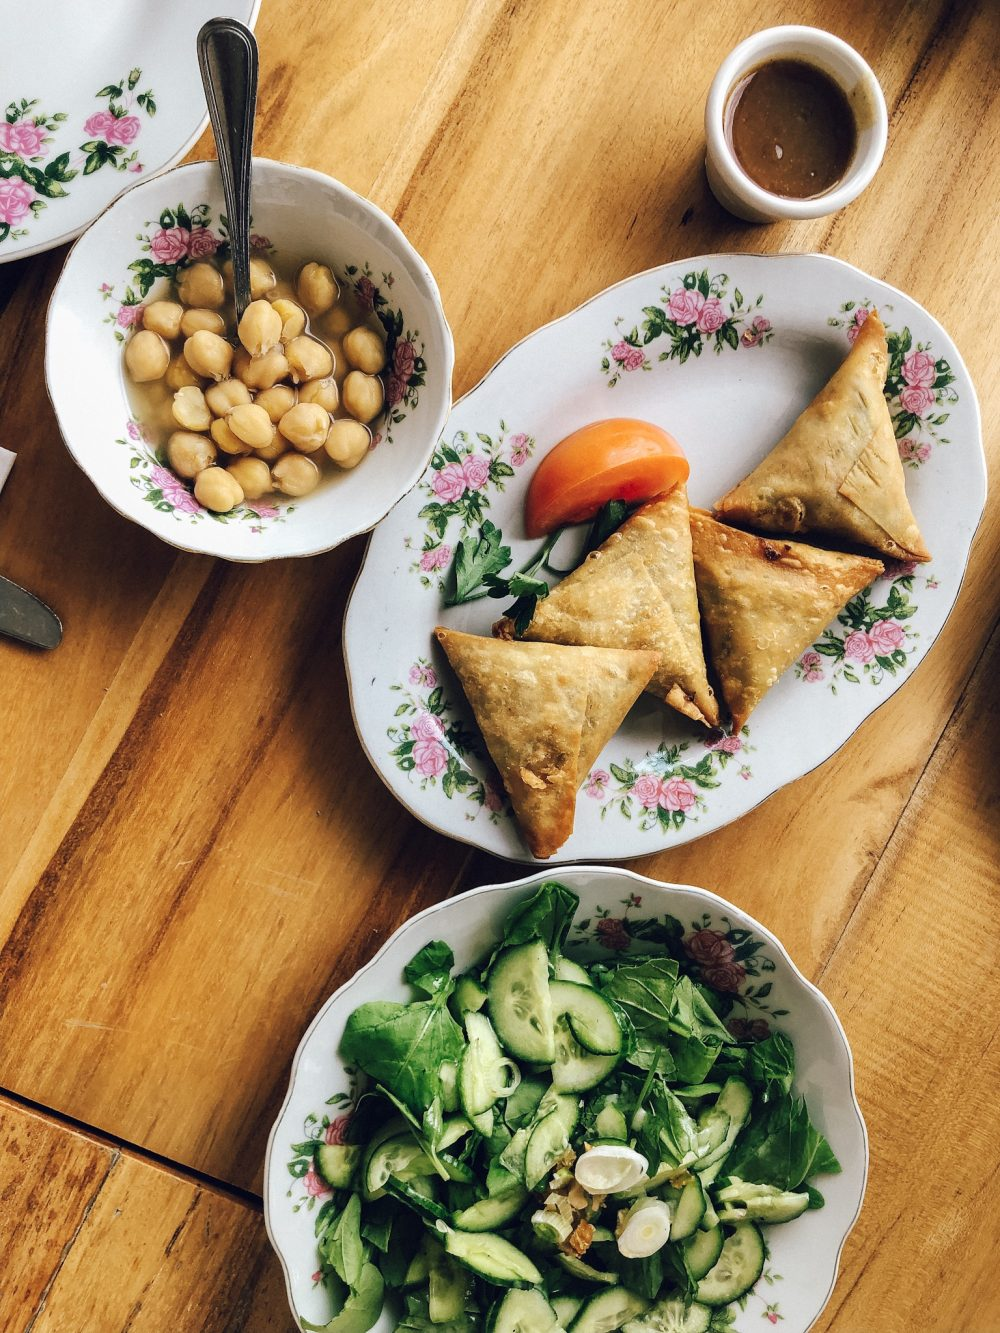 Sharjah Food